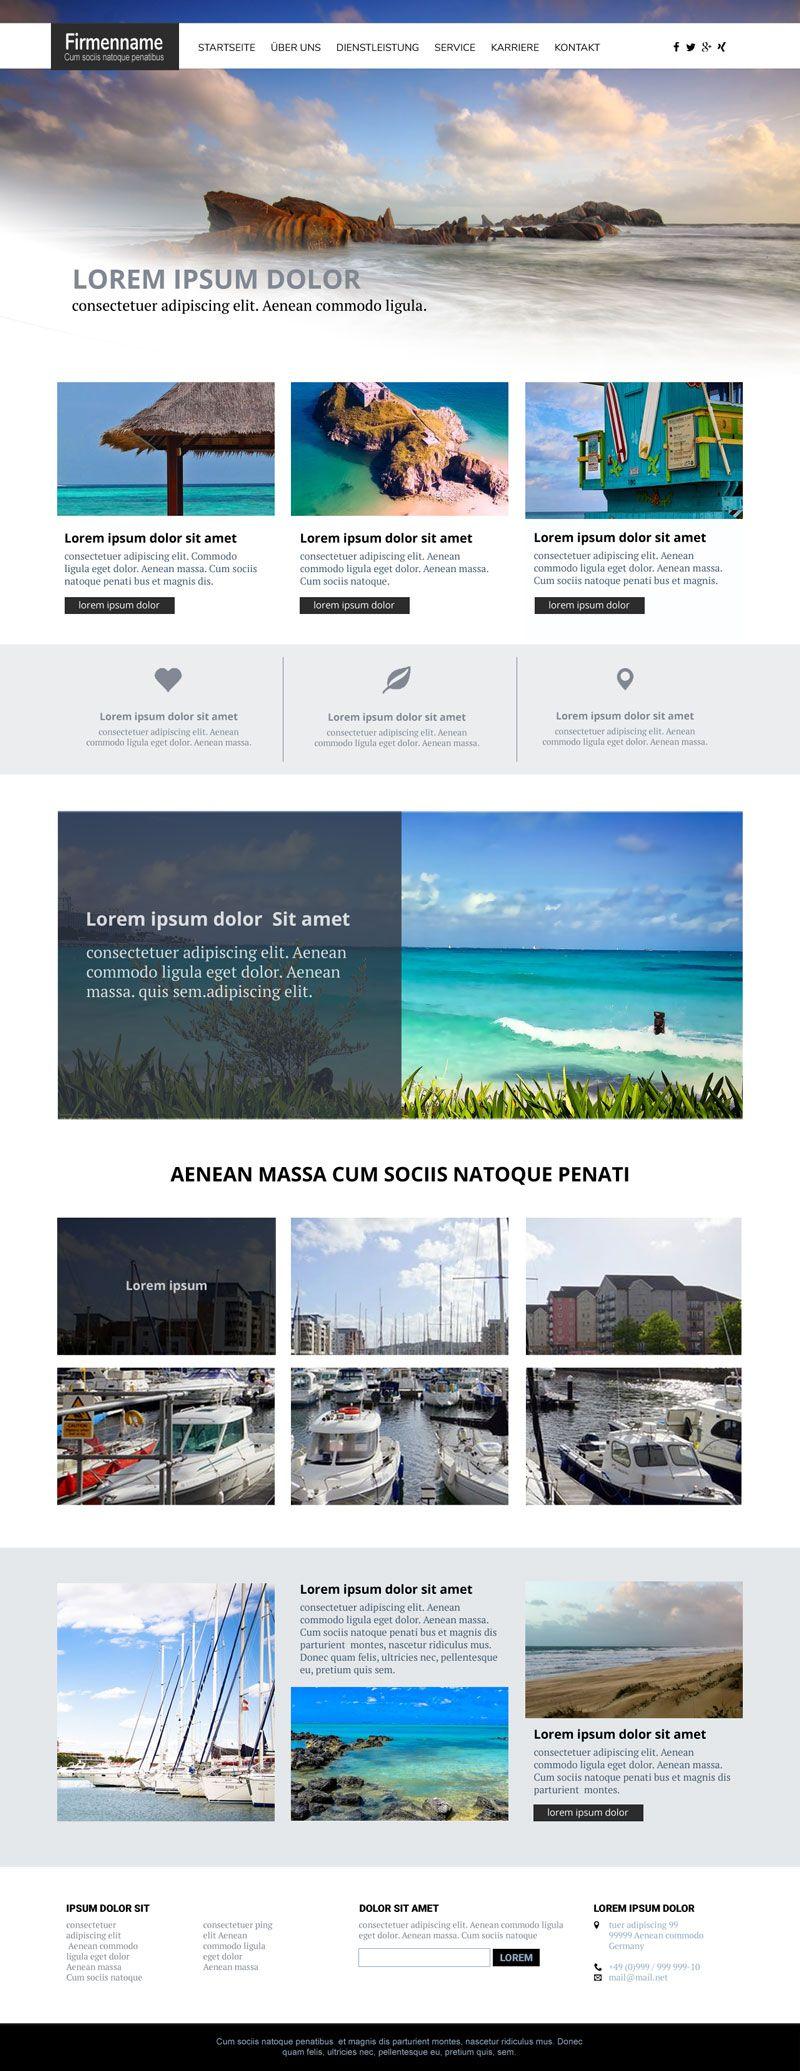 Typo3 Template / Responsive Theme | Web & Web_design | Pinterest ...